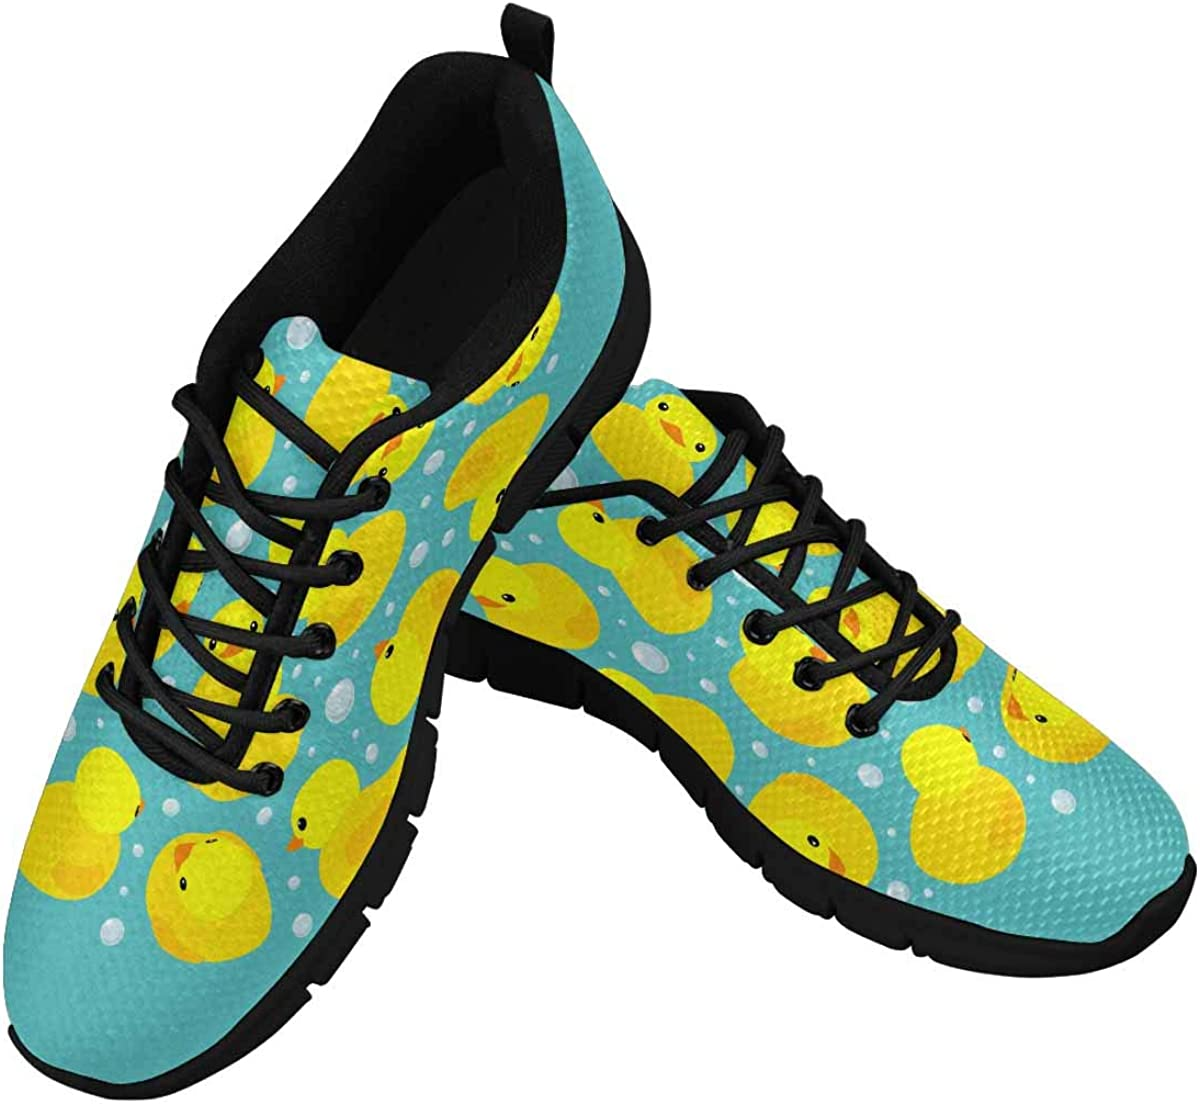 INTERESTPRINT Yellow Rubber Ducks Women's Breathable Non Slip Sneakers